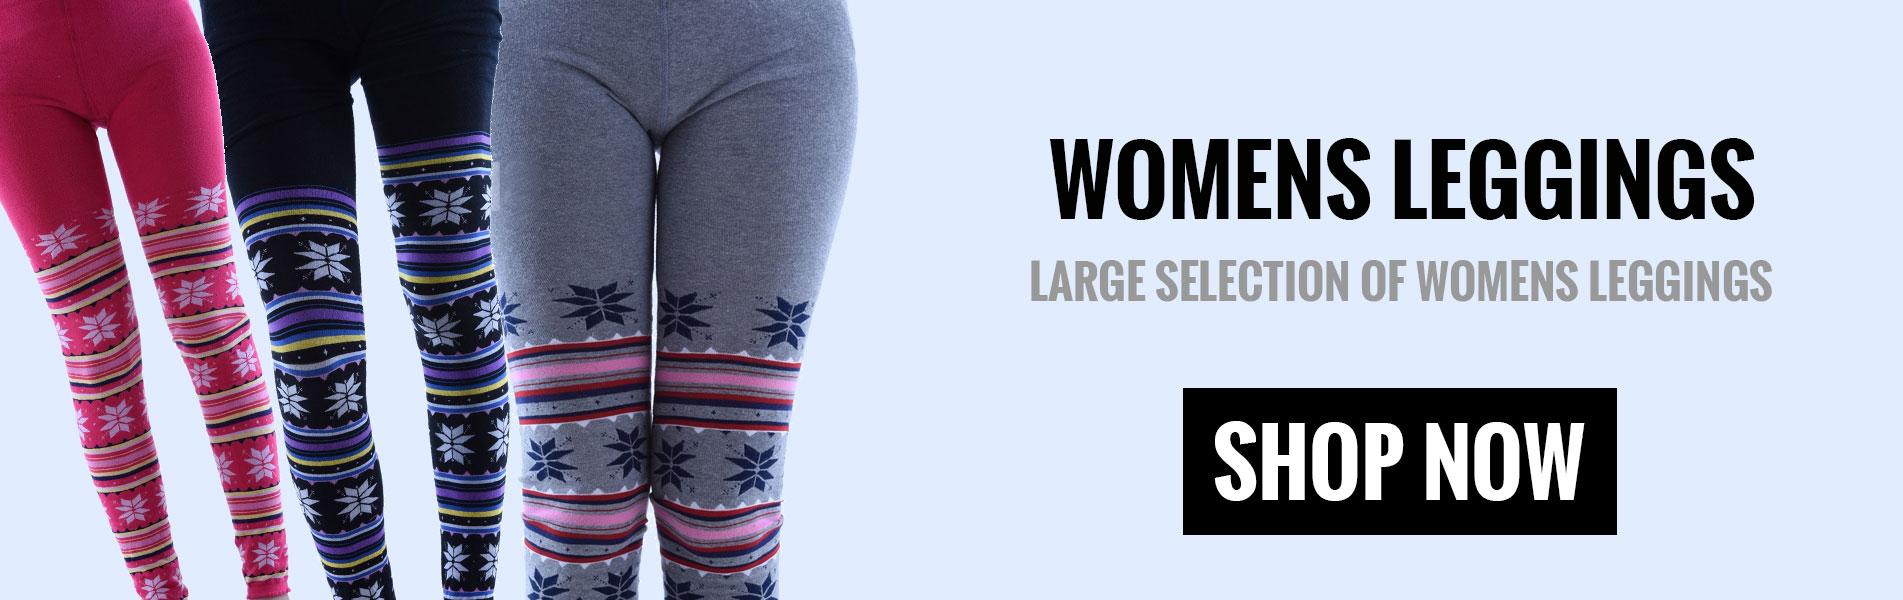 Womens Leggings